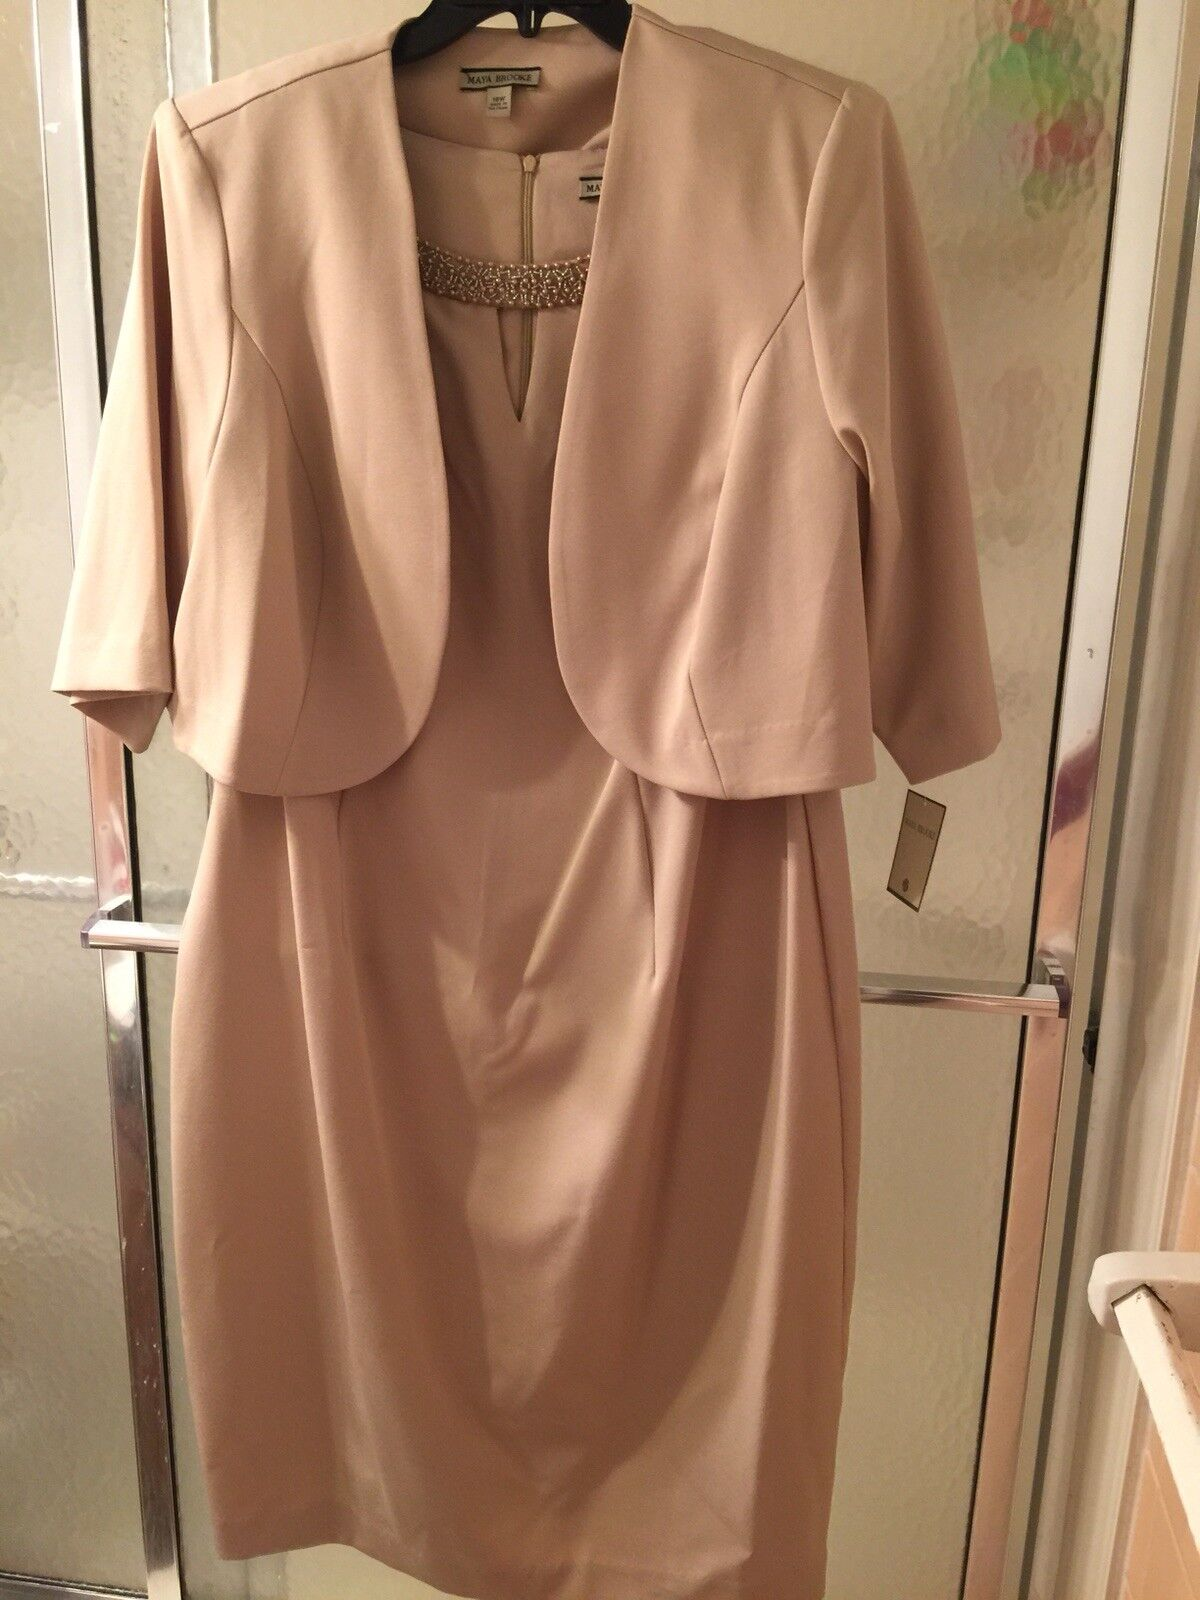 NWT Maya Brooke 2 Piece Gown Suit;Beige; Size 18W; ShortSleeves KneeLength